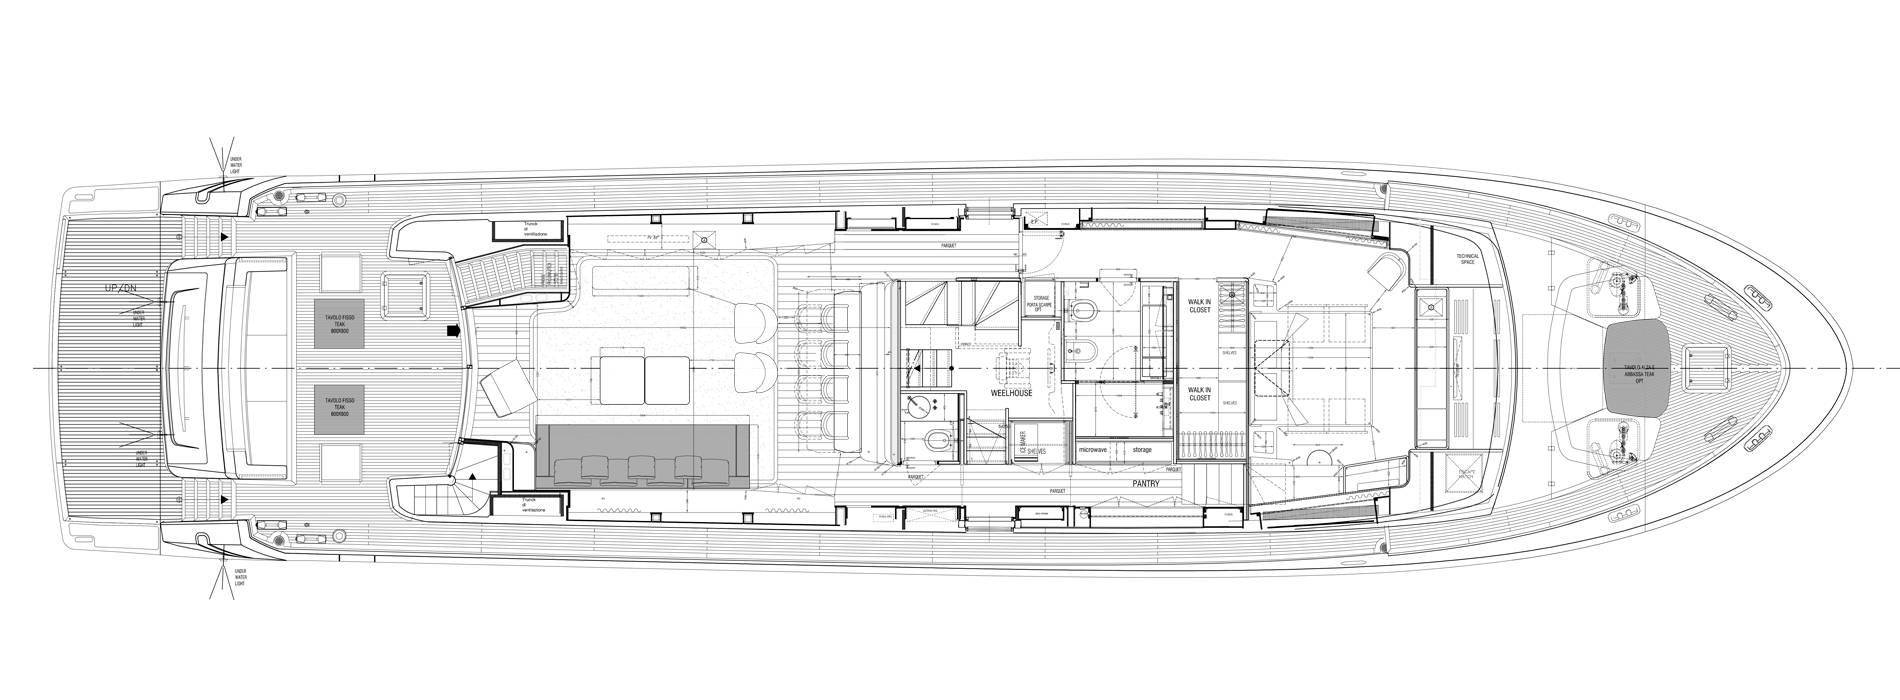 Sanlorenzo Yachts SL96-635 Hauptdeck